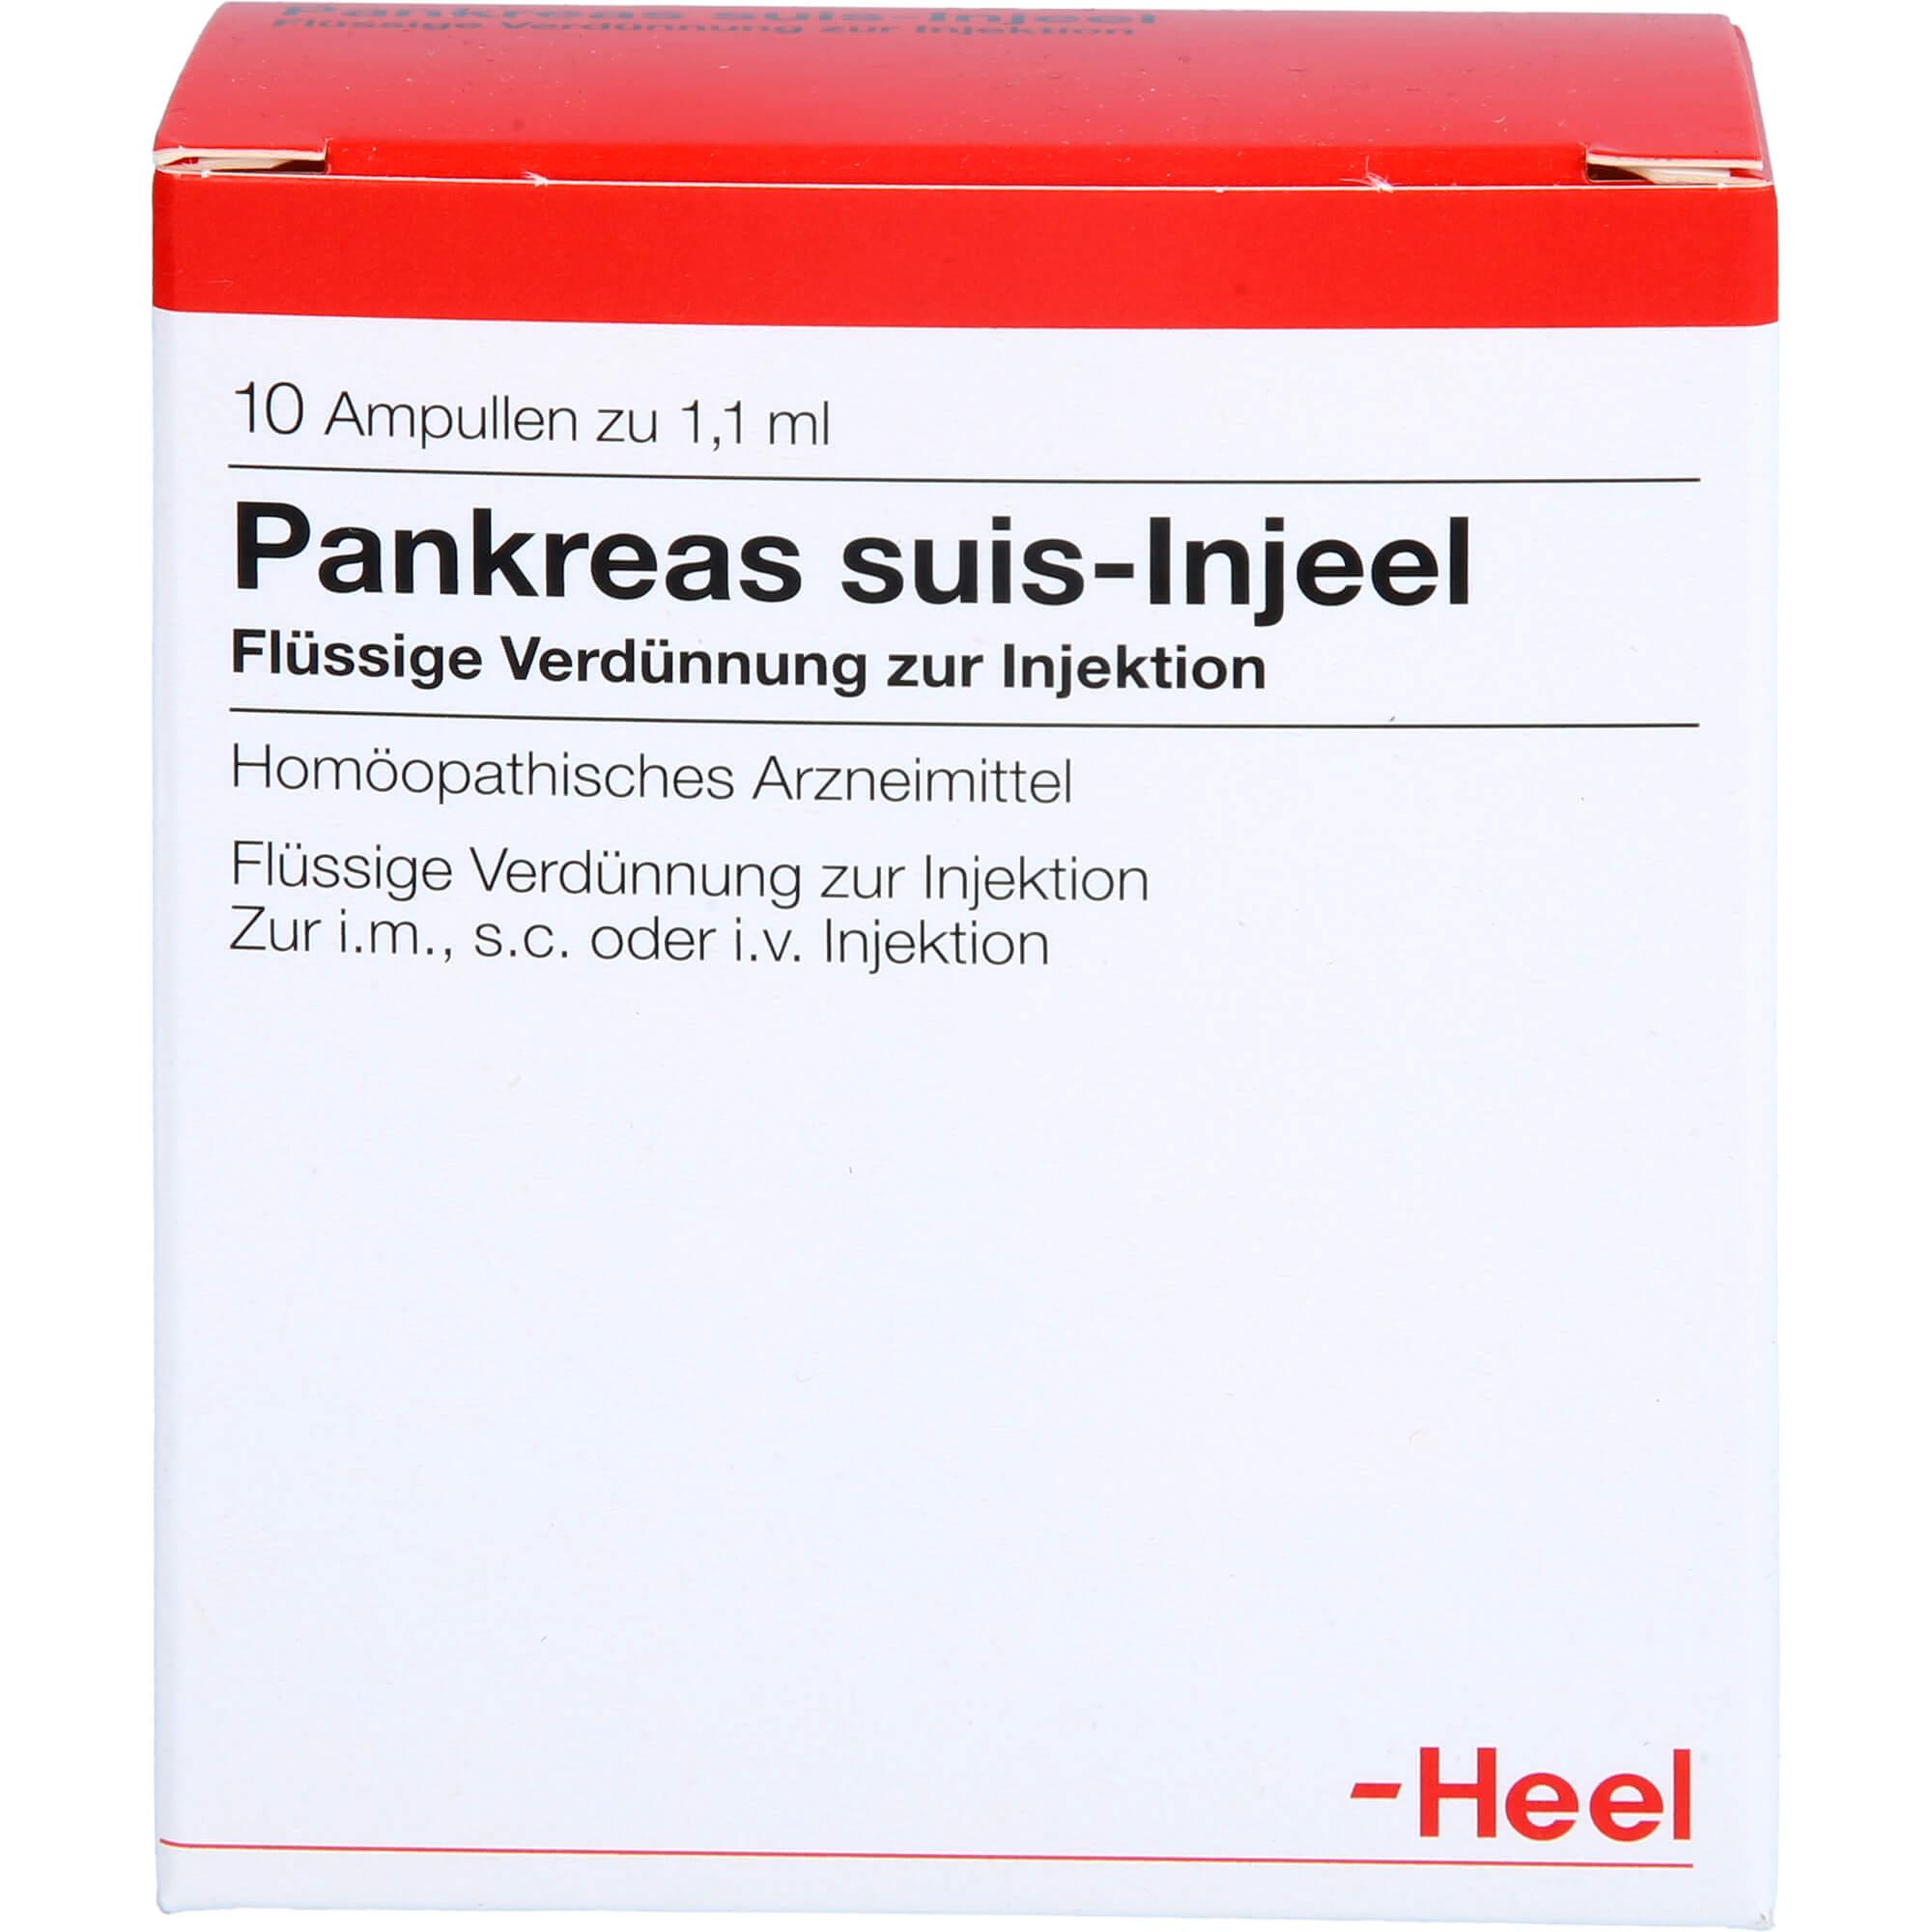 PANKREAS-SUIS-Injeel-Ampullen